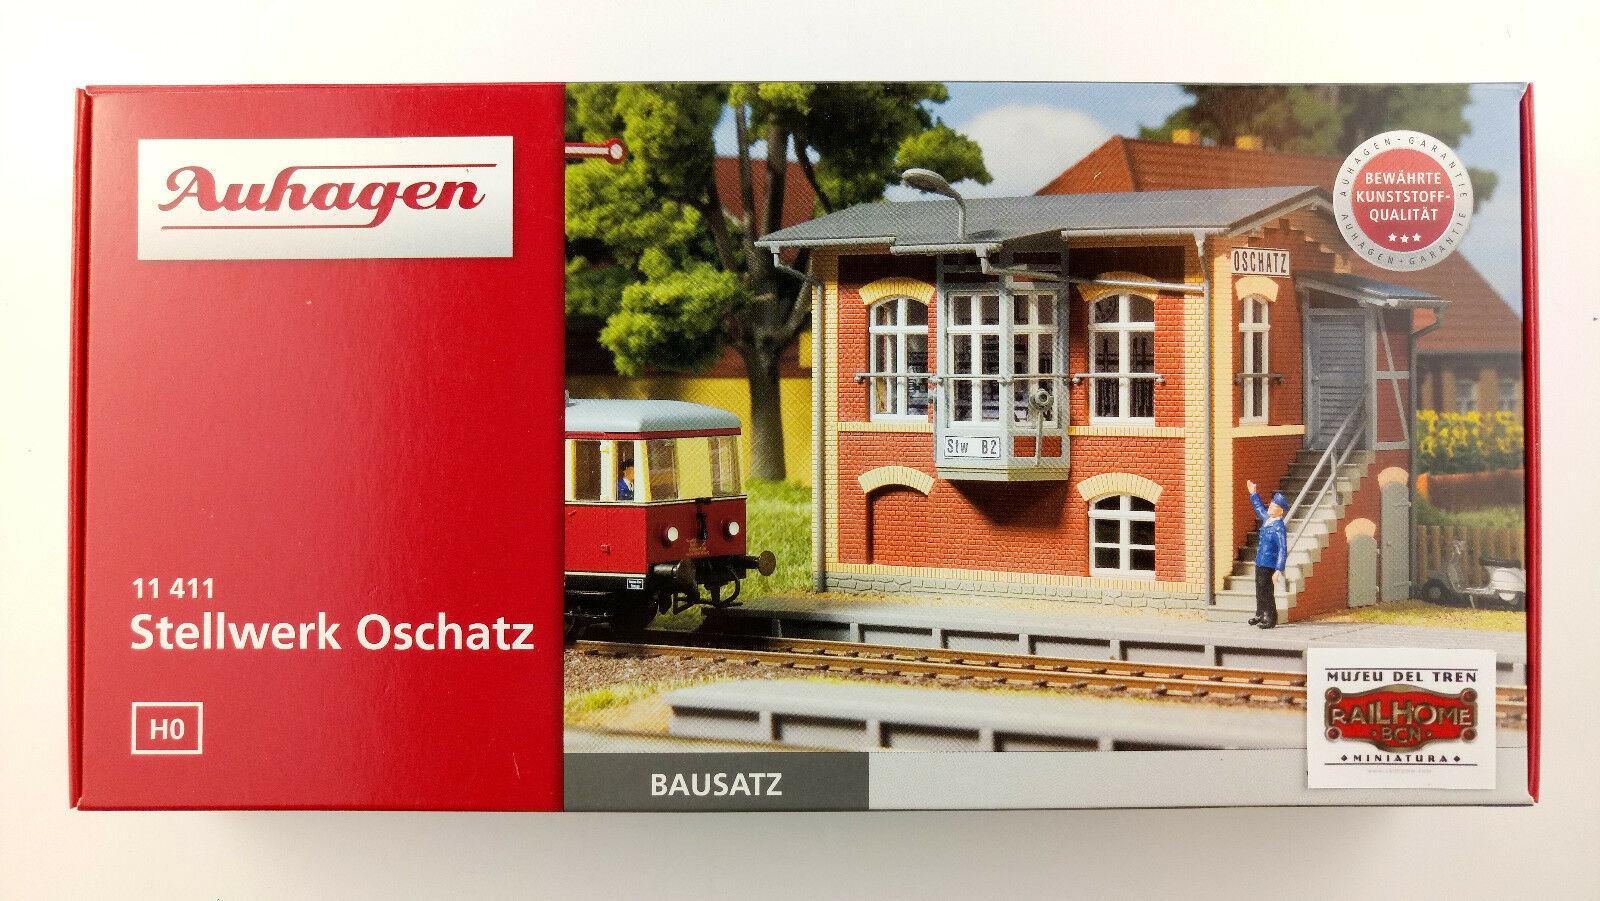 AUHAGEN H0 11411 - STELLWERK OSCHATZ - NEW - N GAUGE BUILDING KIT BOXED ORIGINAL